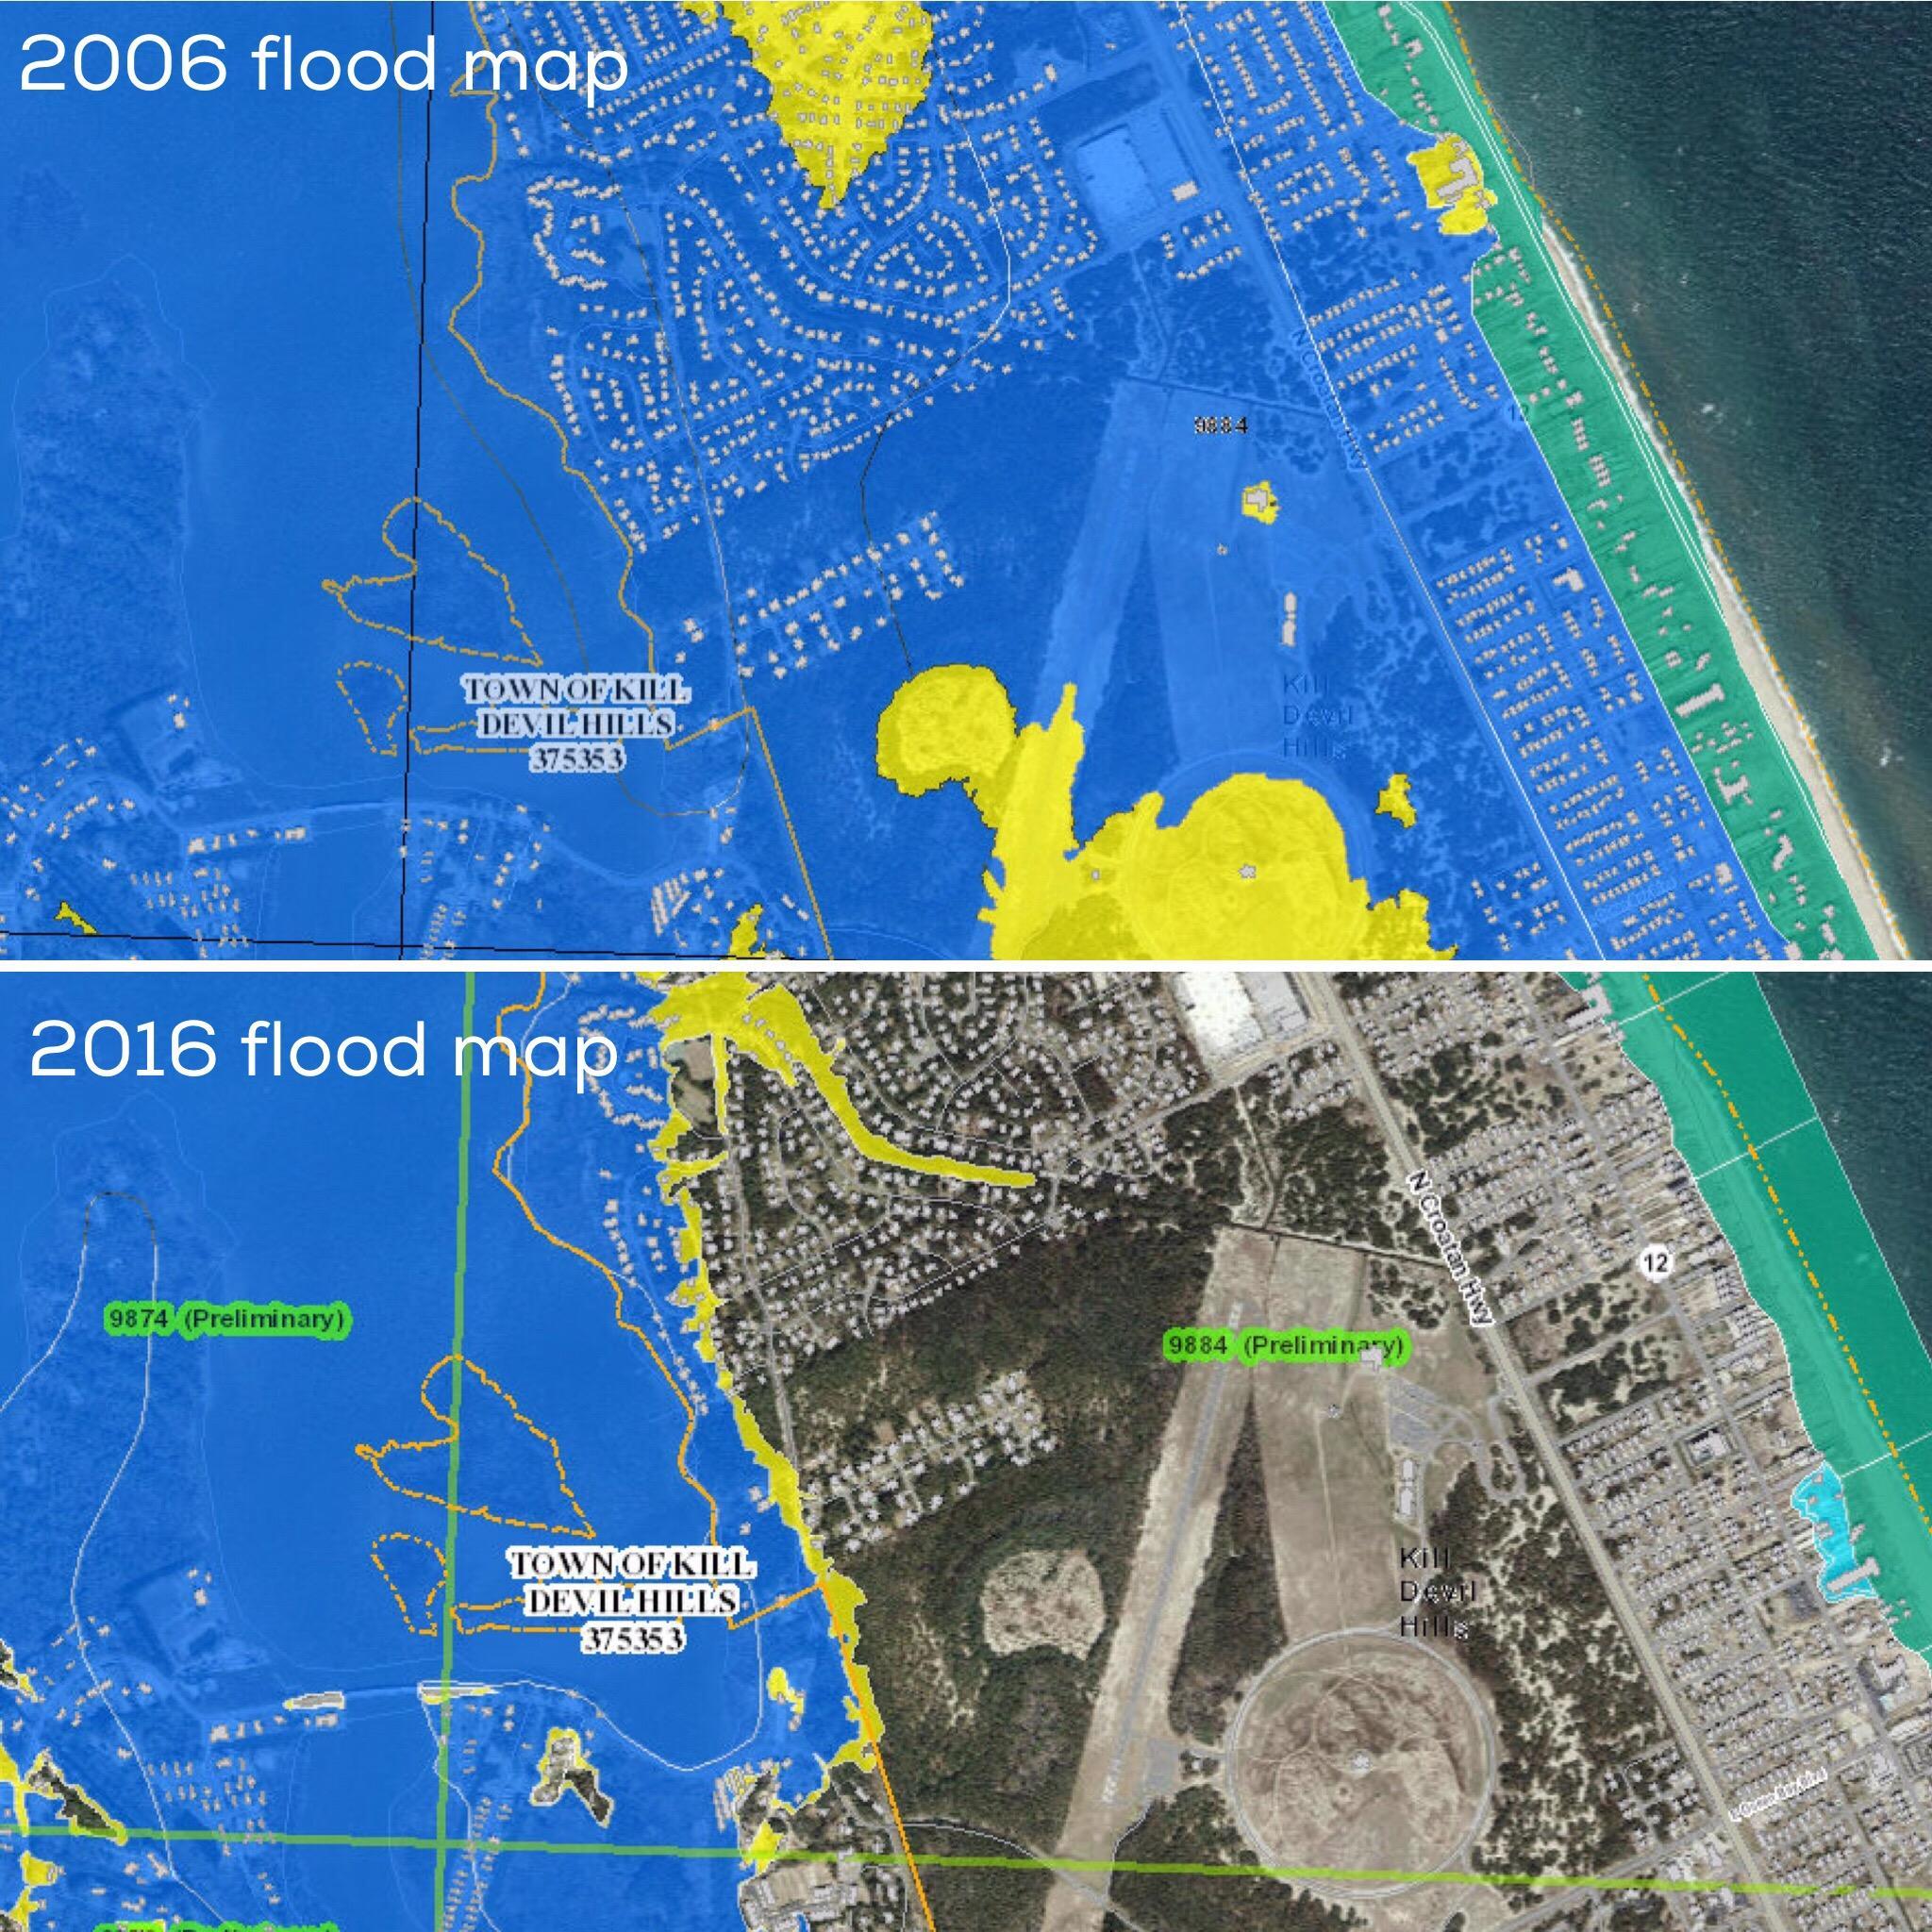 New Flood Maps Downgrade Risk For Coastal Properties WUNC - Nc flood maps